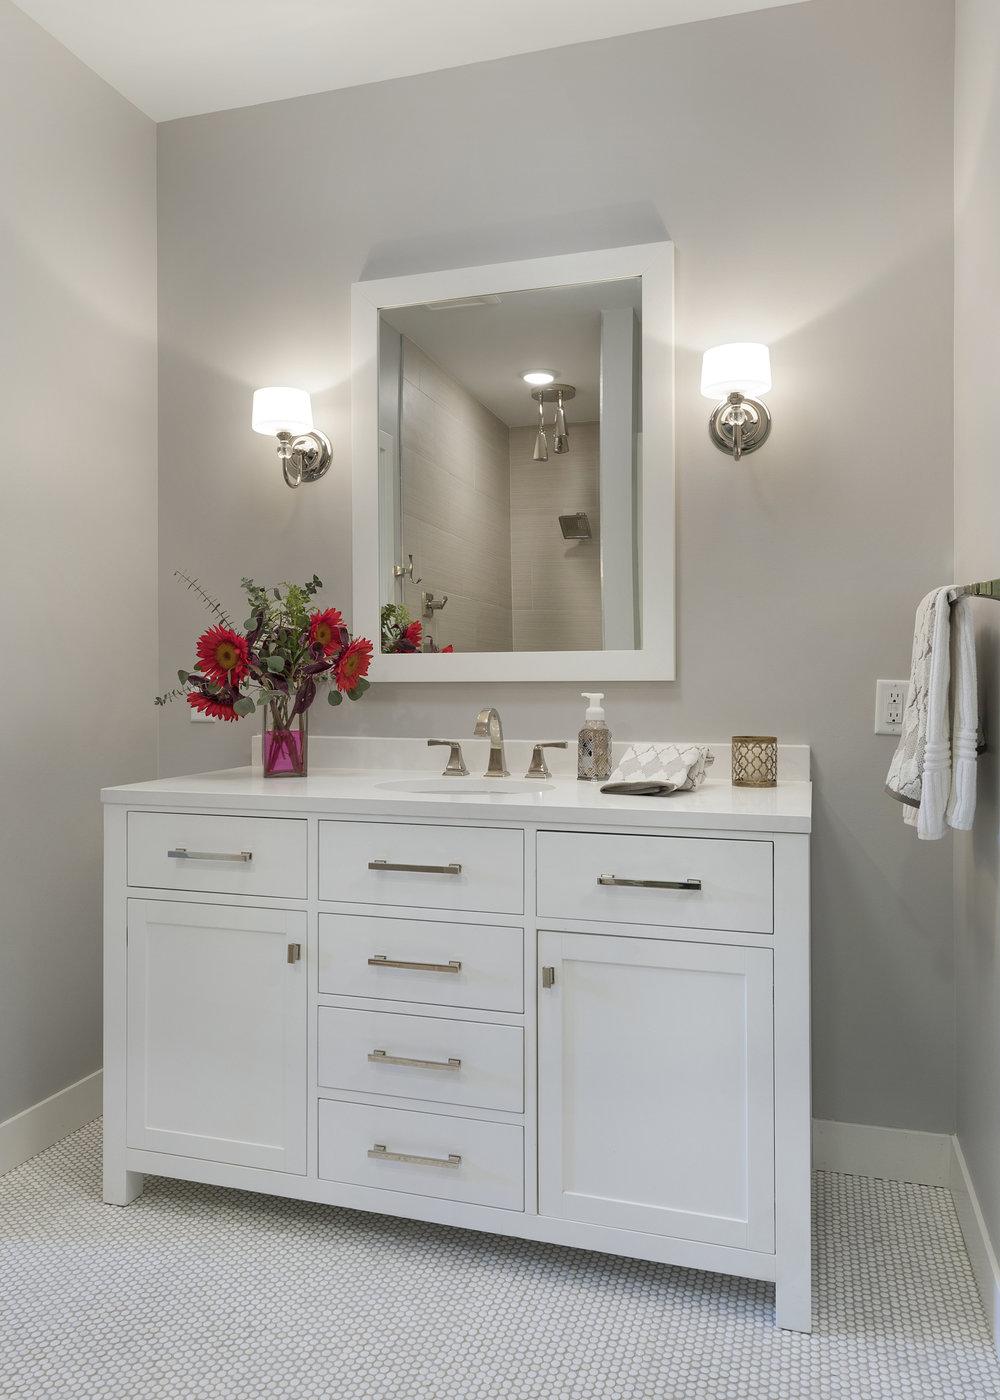 Moms Design Build - Basement Bathroom Design Remodel Vanity